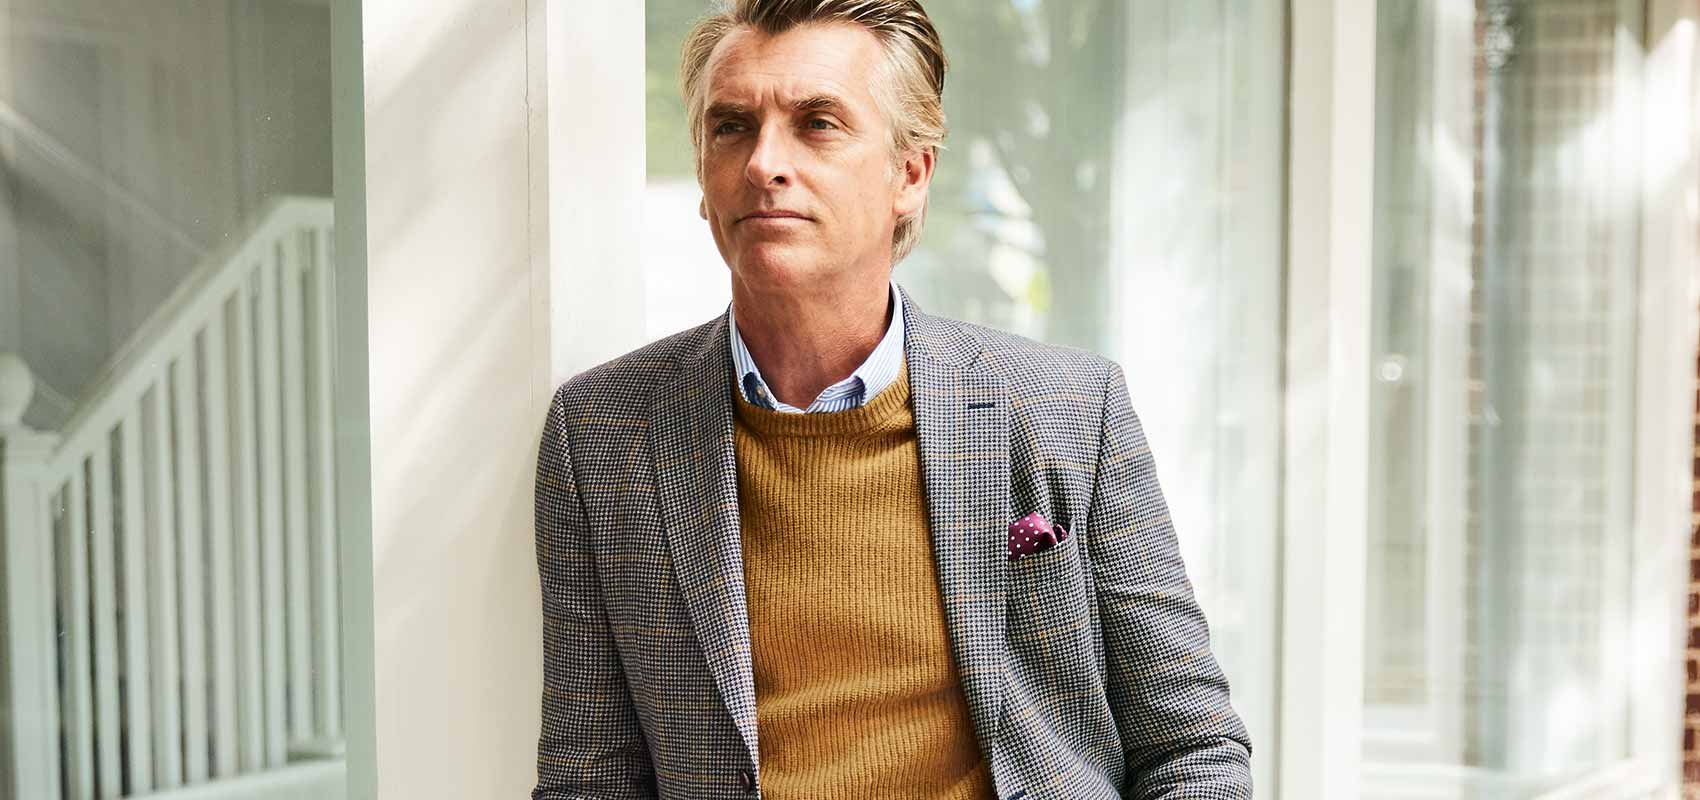 Charles Tyrwhitt tweed jackets